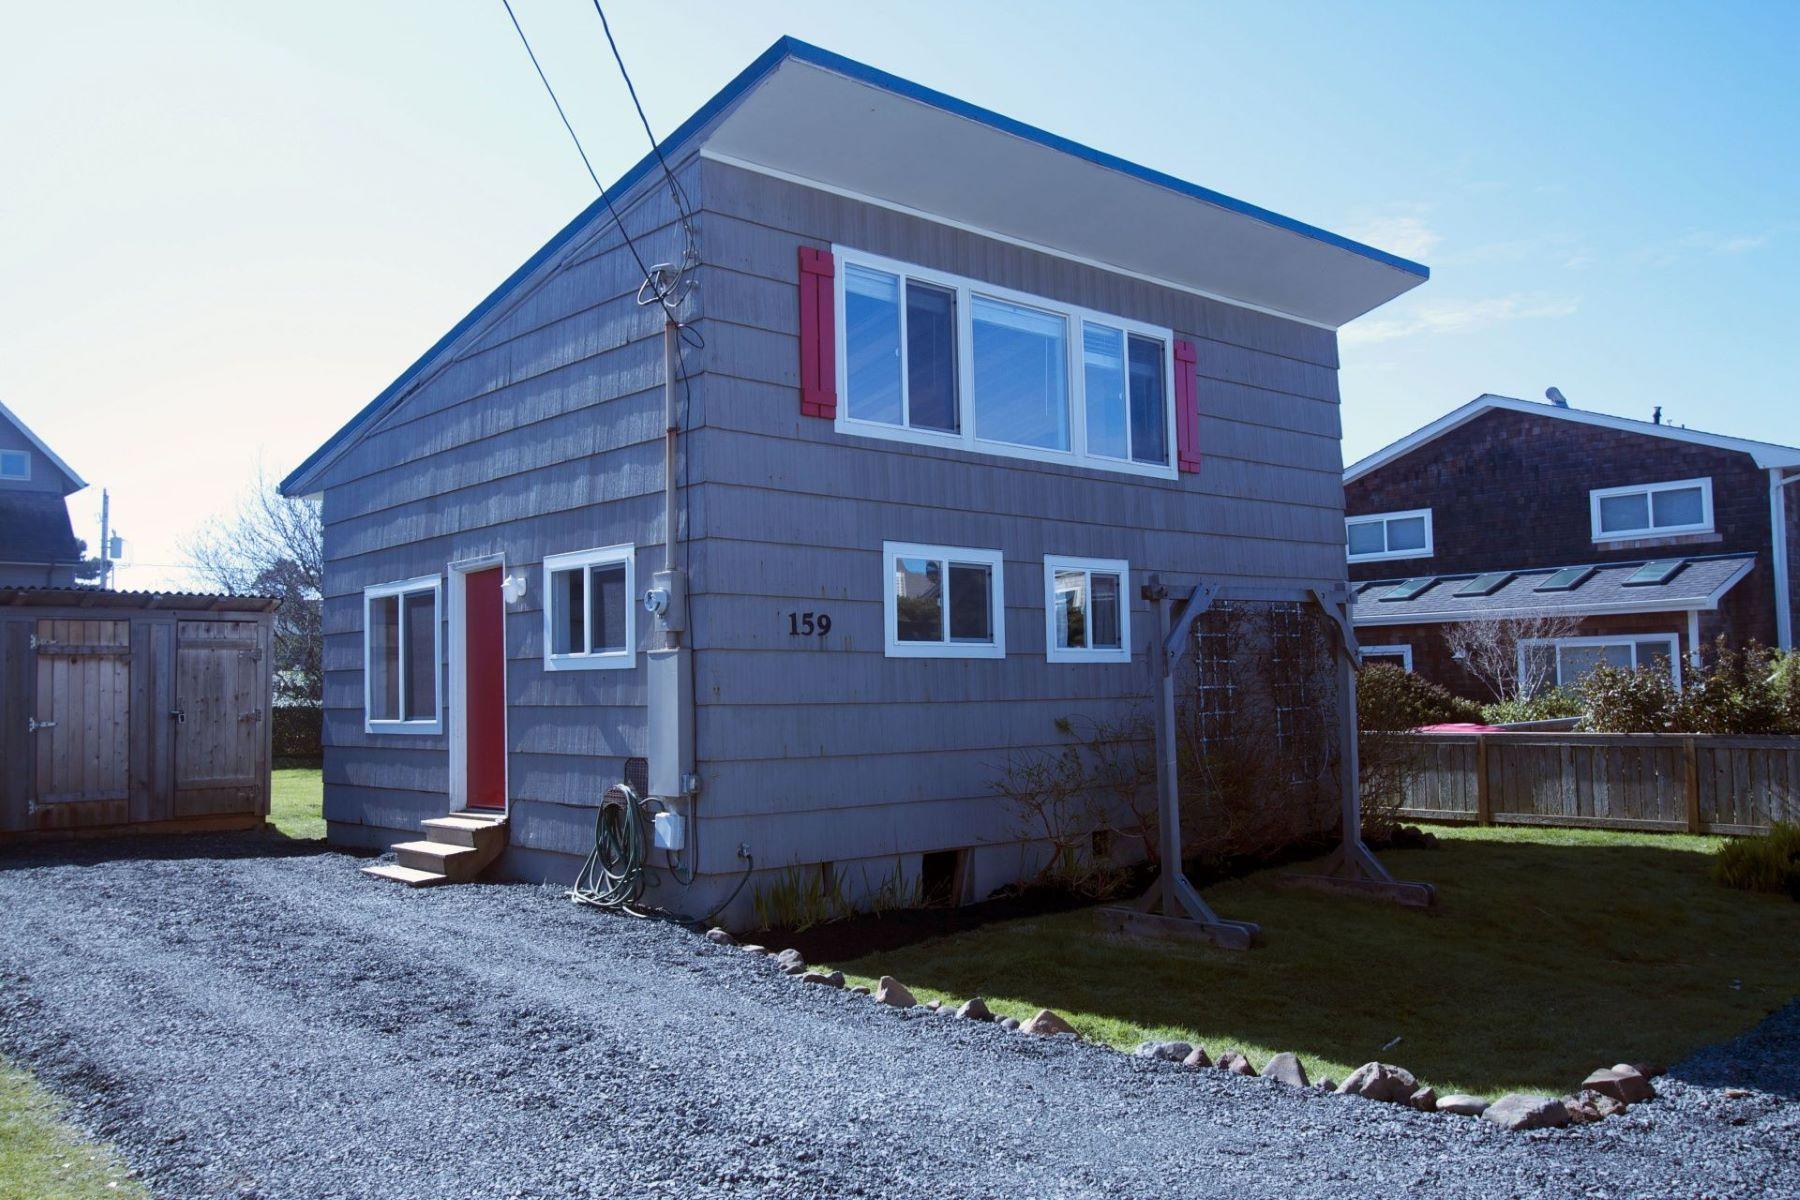 Single Family Homes για την Πώληση στο 159 W Chisana ST Cannon Beach, OR 97110 Cannon Beach, Ορεγκον 97110 Ηνωμένες Πολιτείες